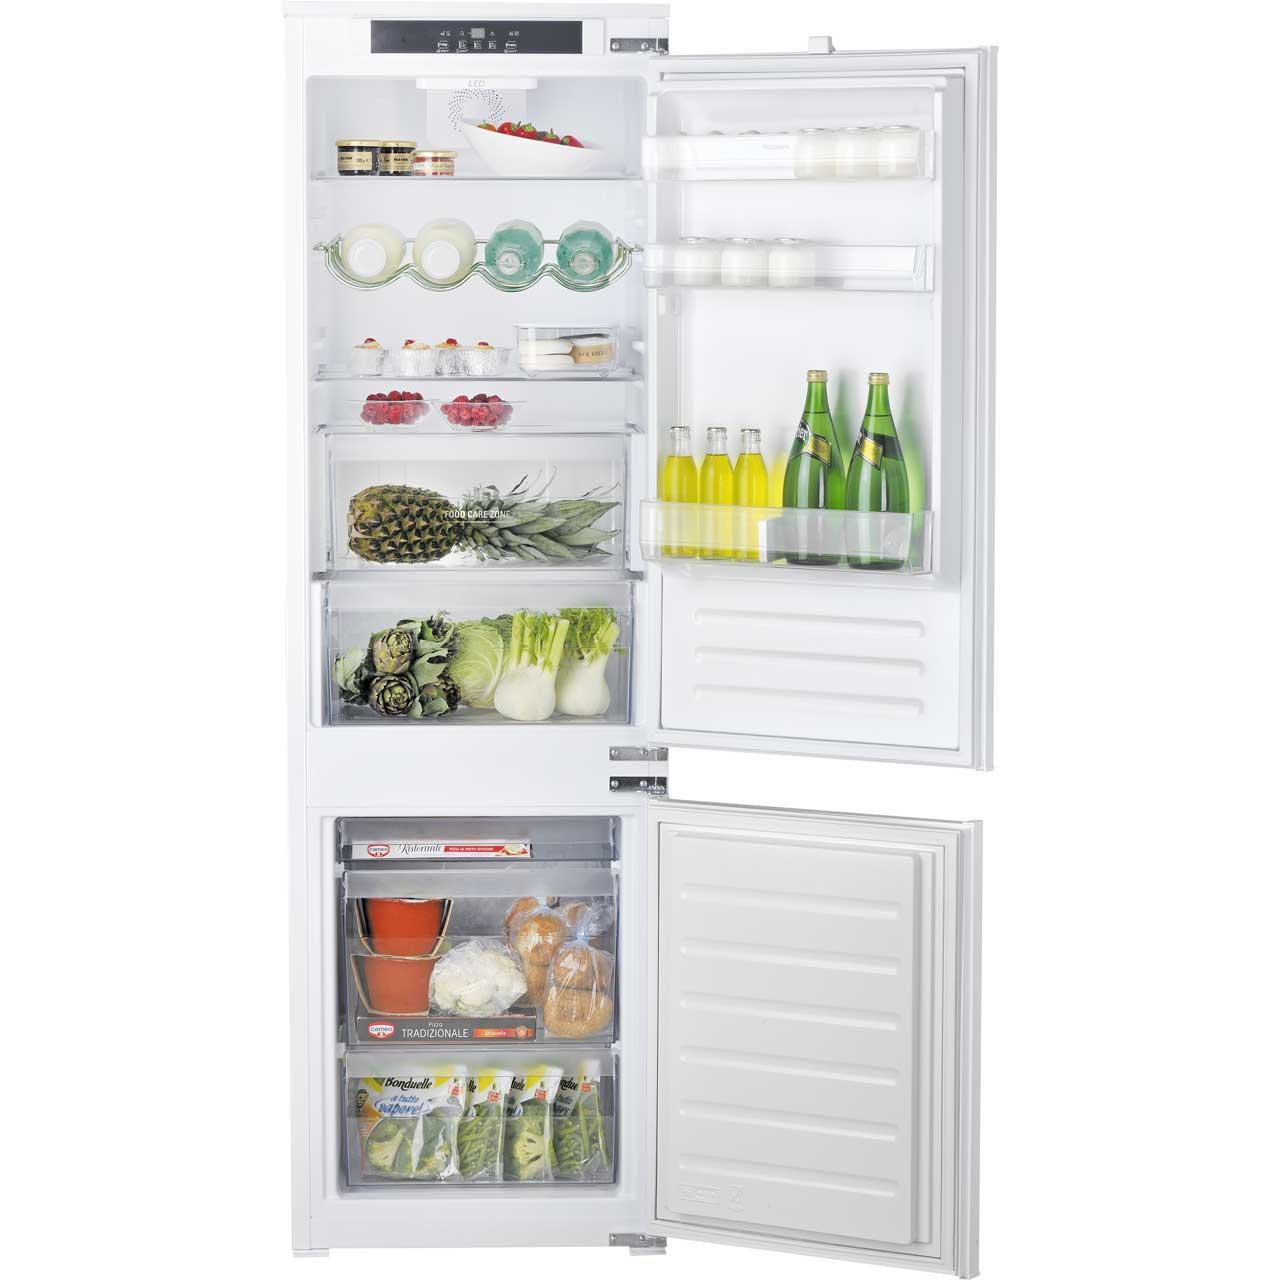 Hotpoint HM7030ECAA Integrated Fridge Freezer in White